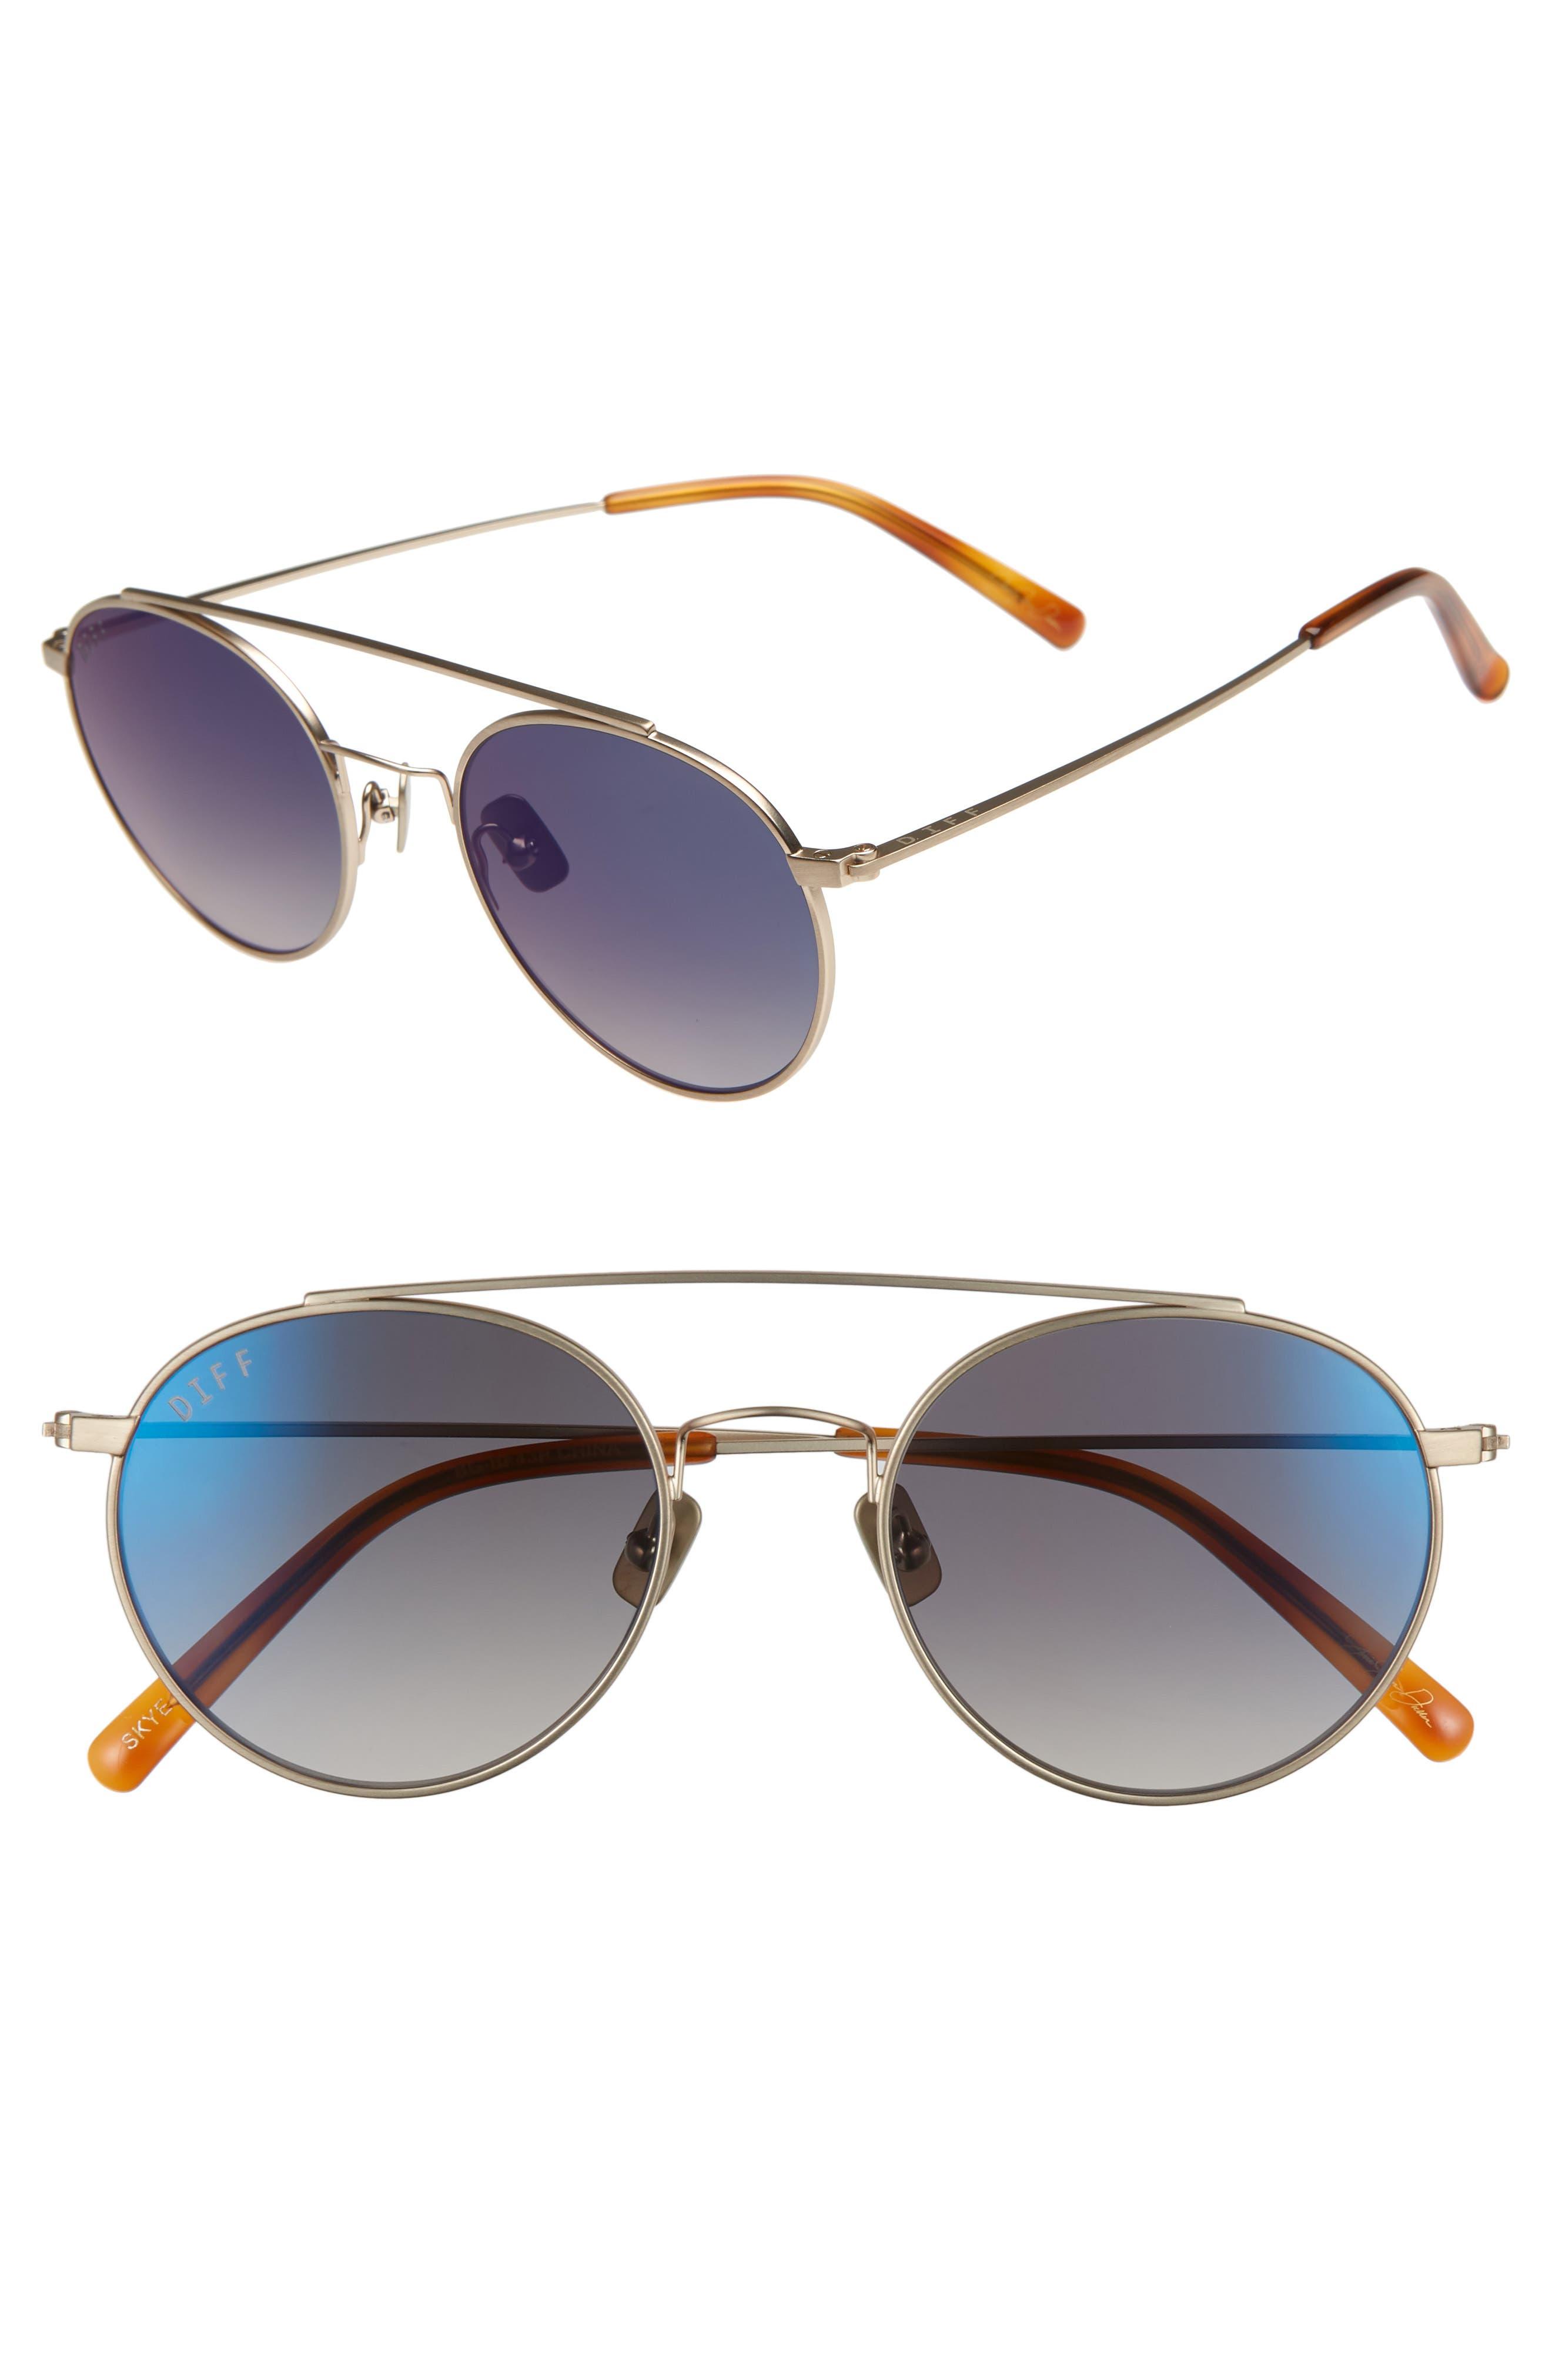 Skye 51mm Aviator Sunglasses,                         Main,                         color, BRUSHED GOLD/ BLUE